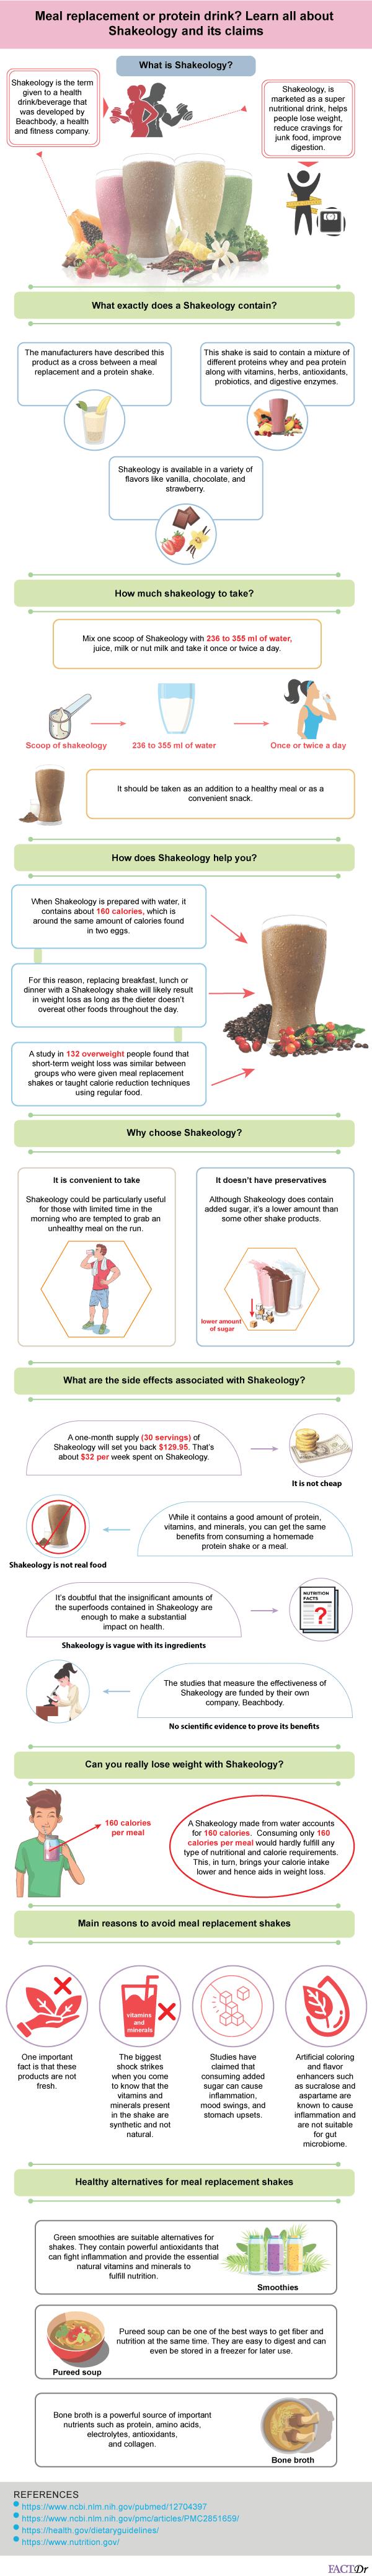 shakeology infographic